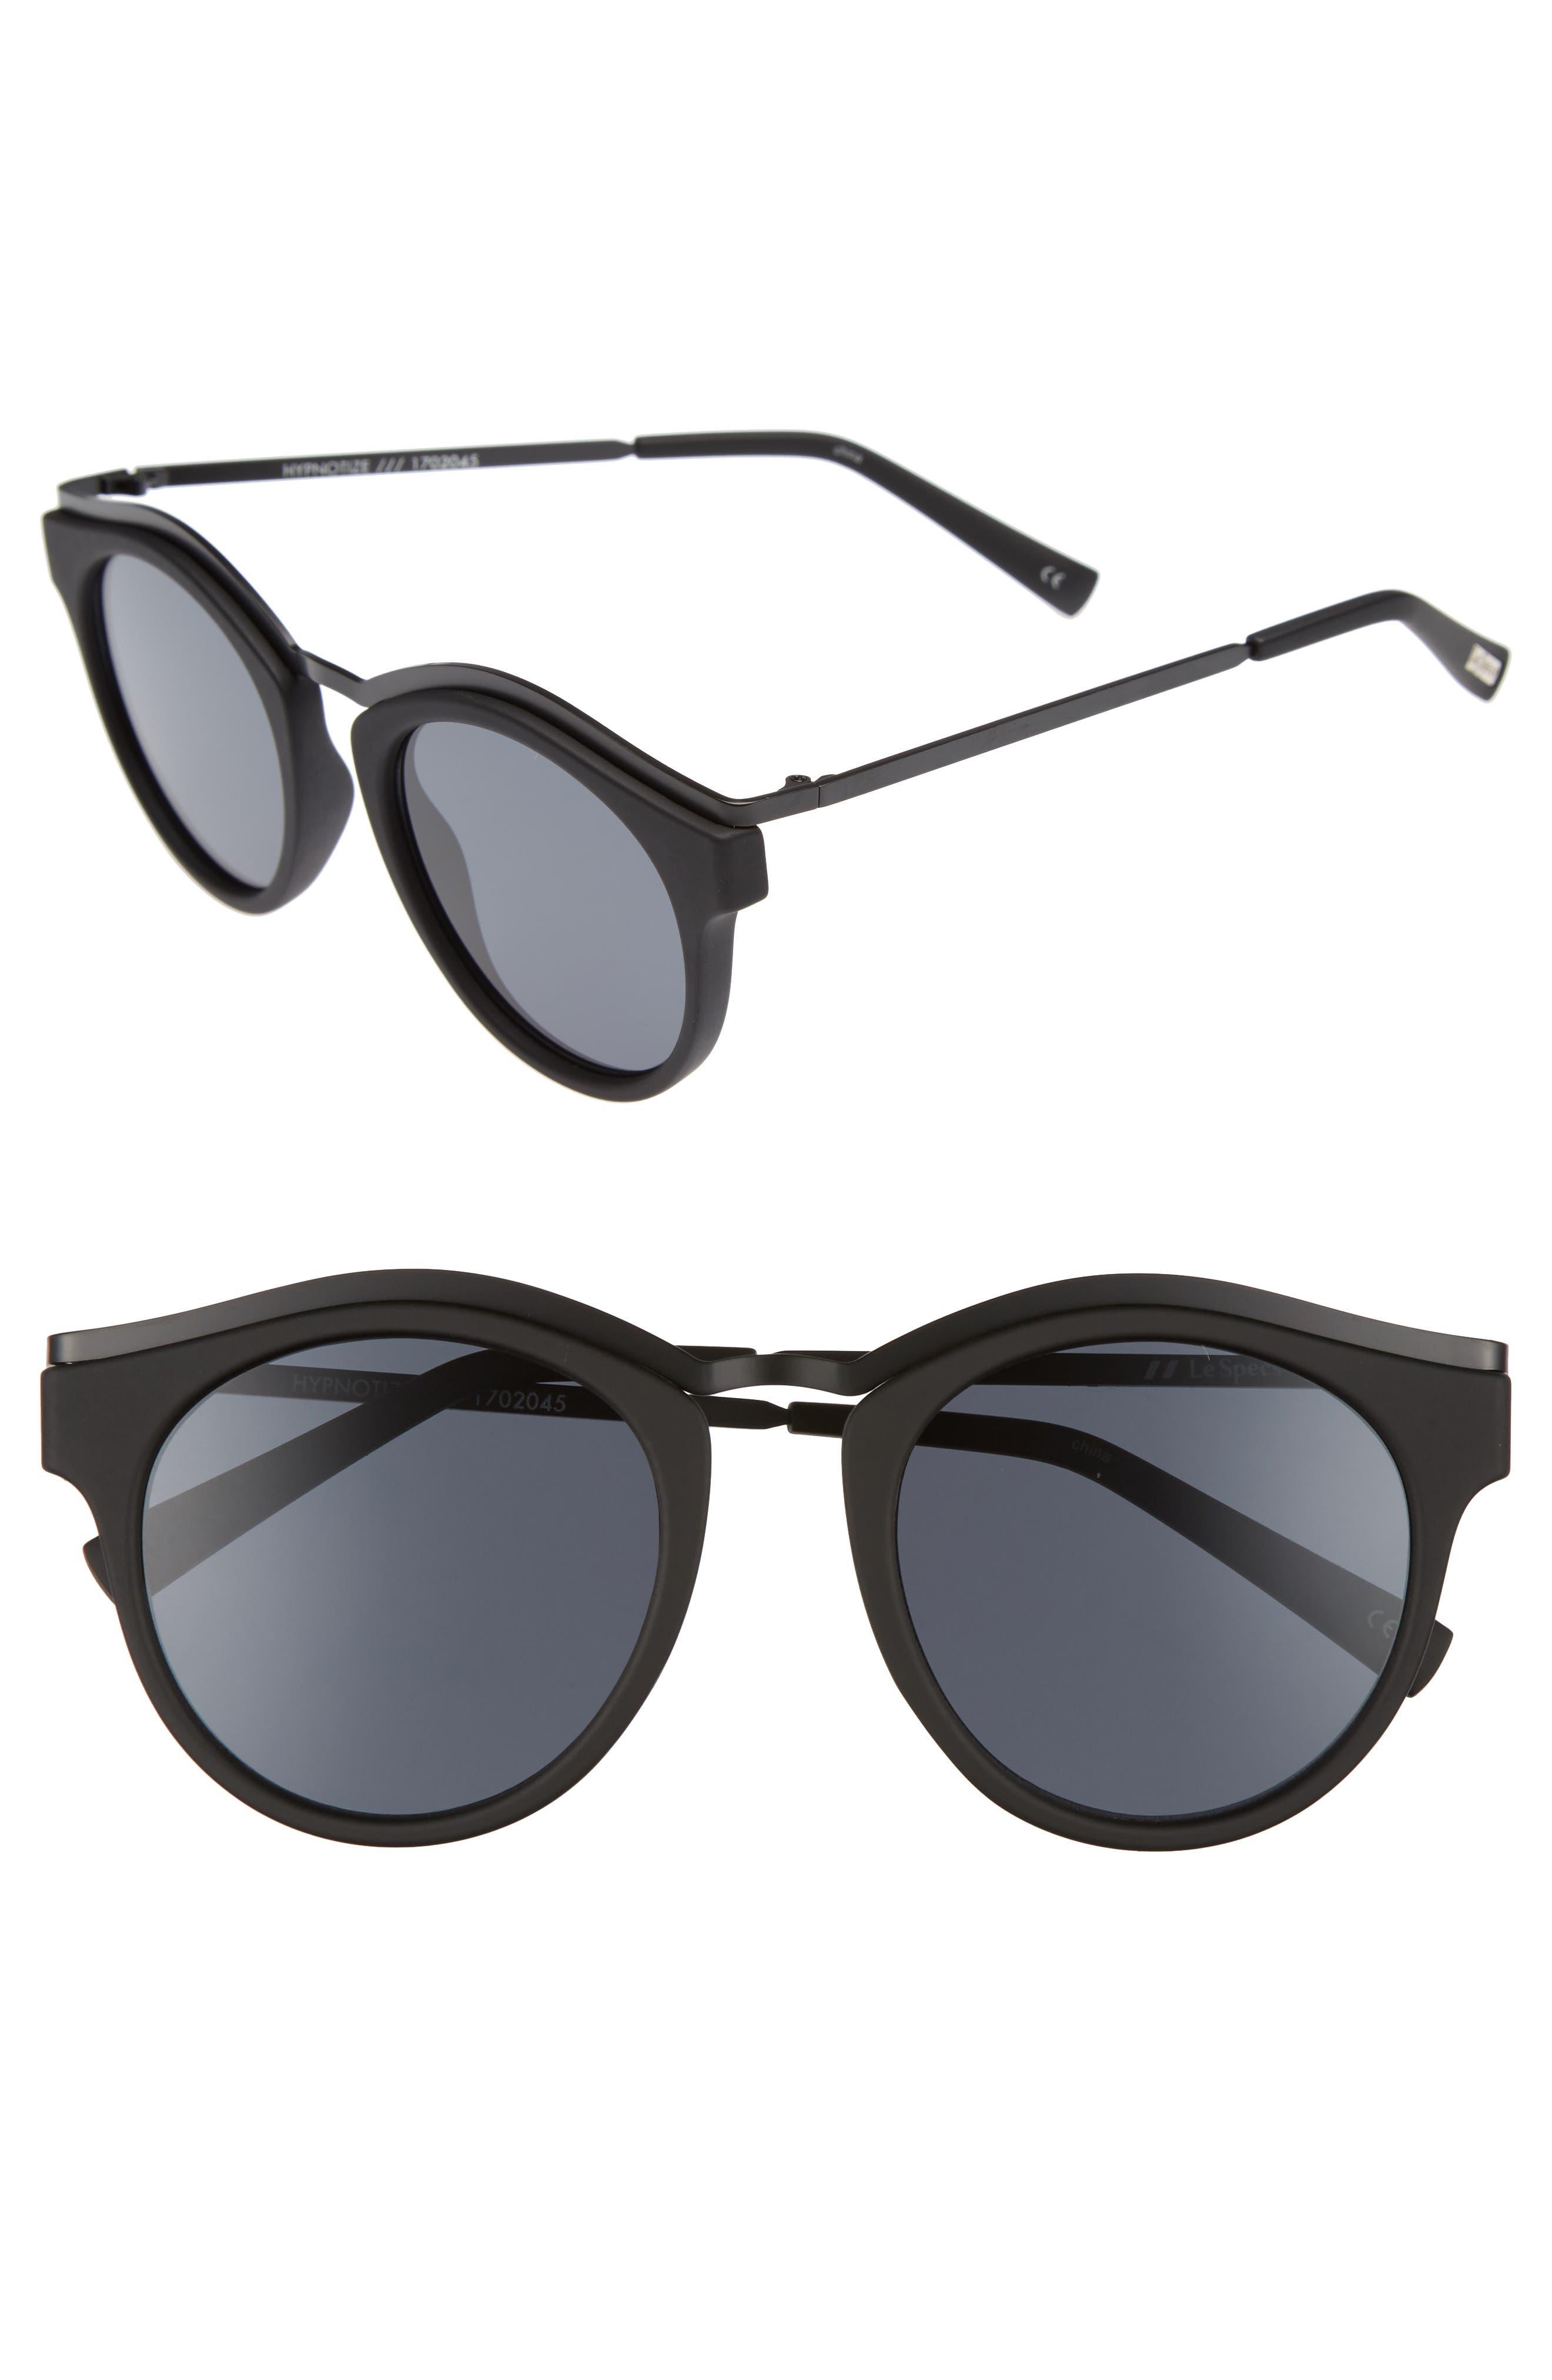 Le Specs Hypnotize 50mm Round Sunglasses